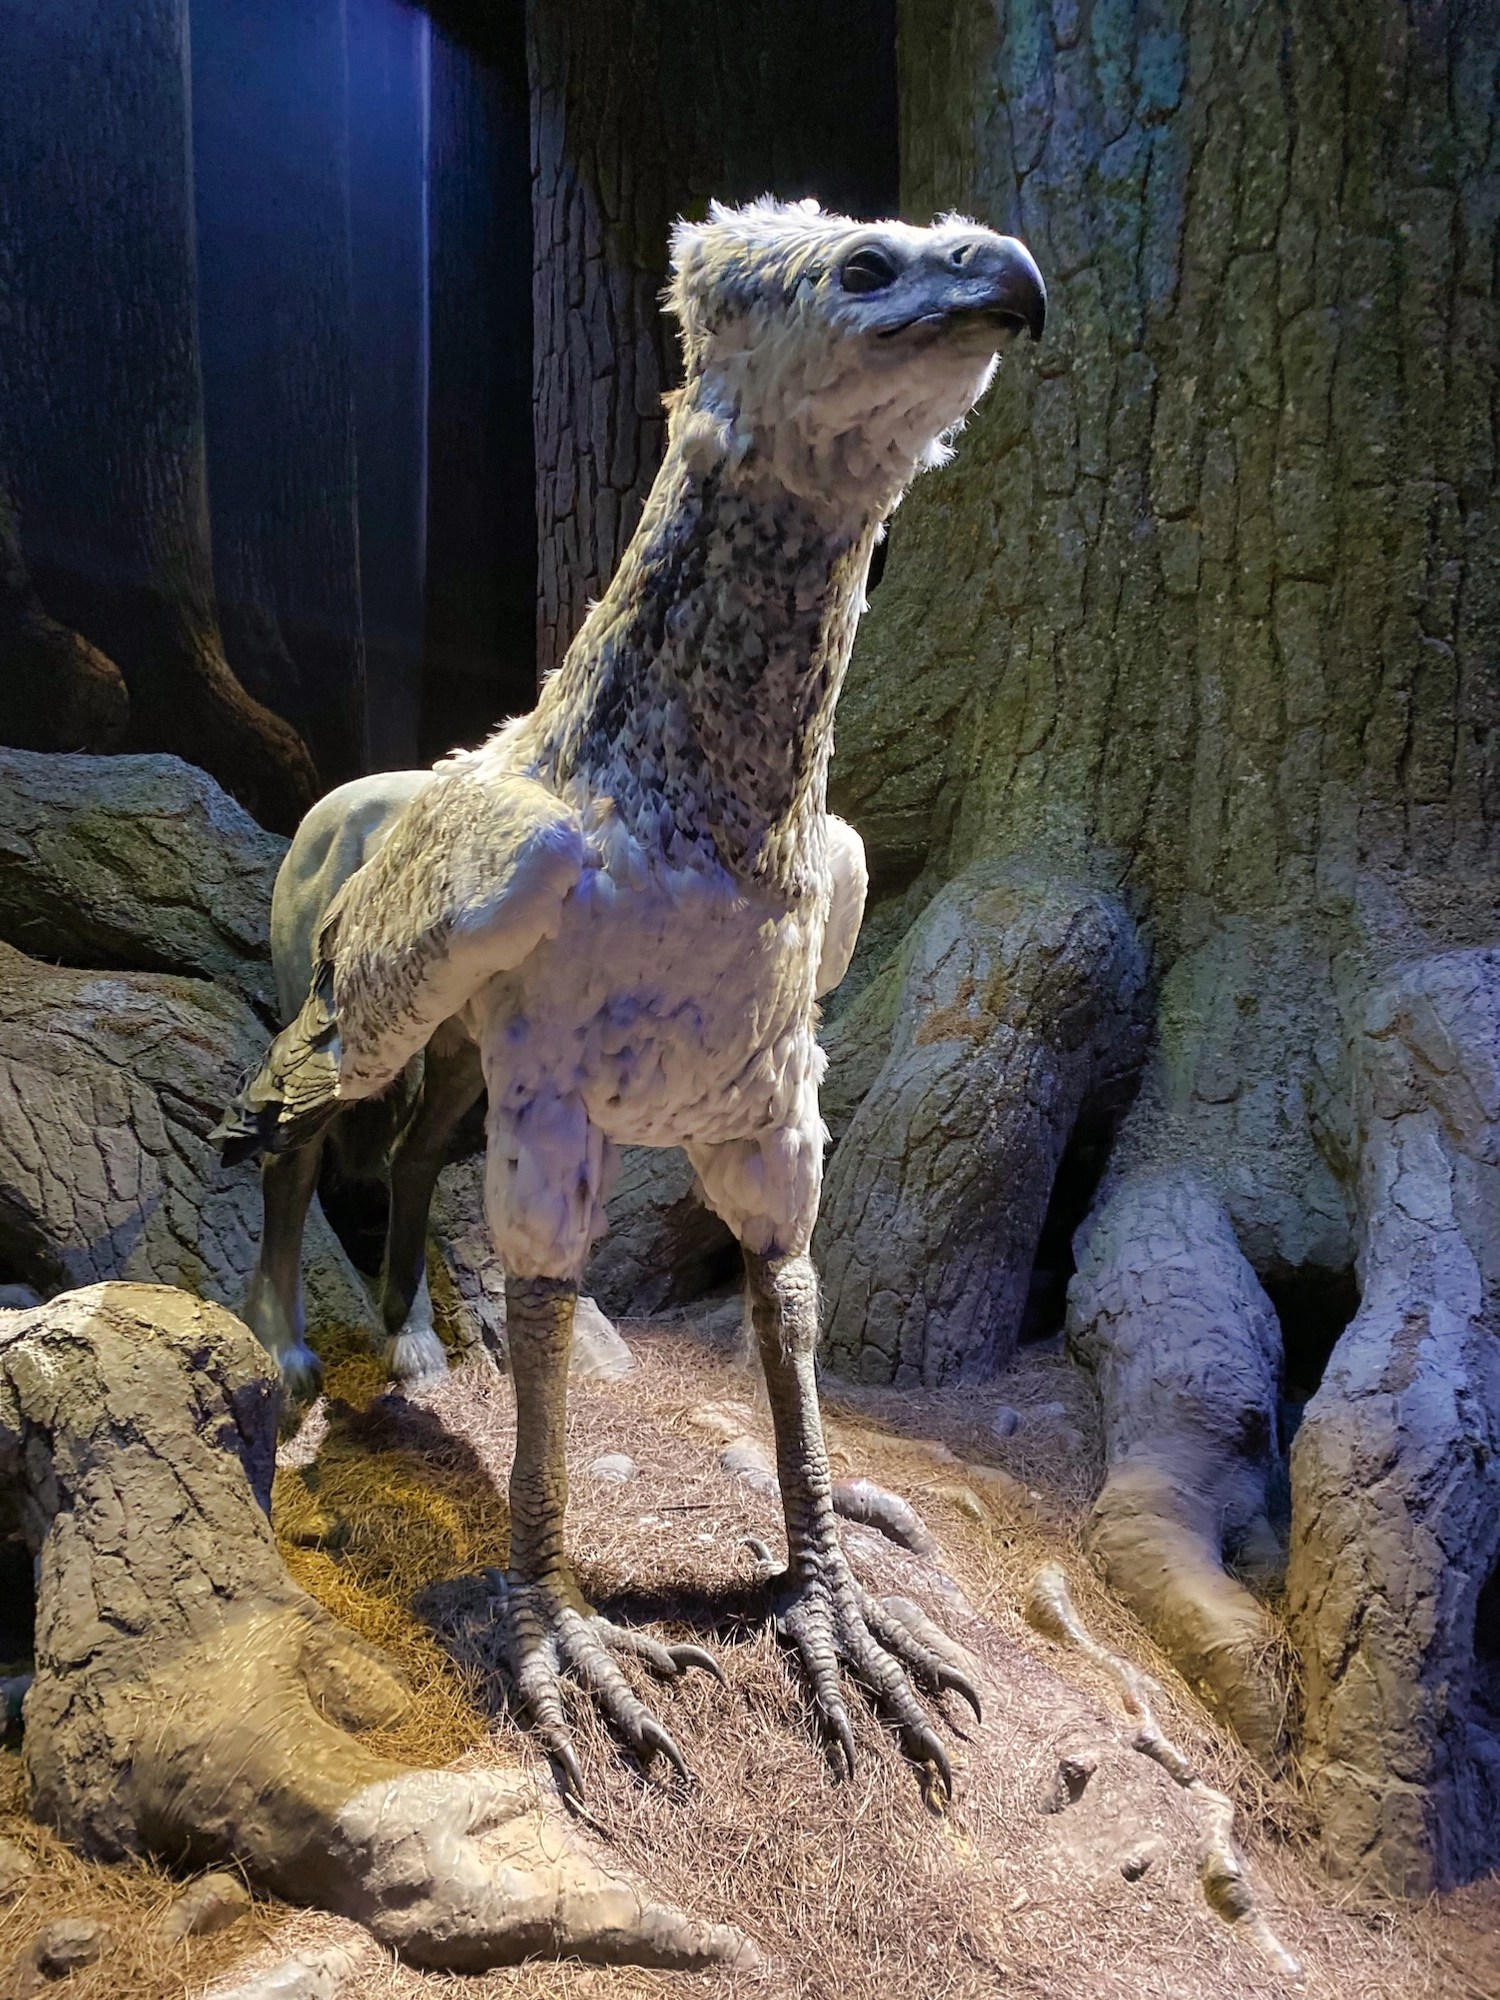 Harry Potter Studio Tour - Forbidden Forest - Buckbeak